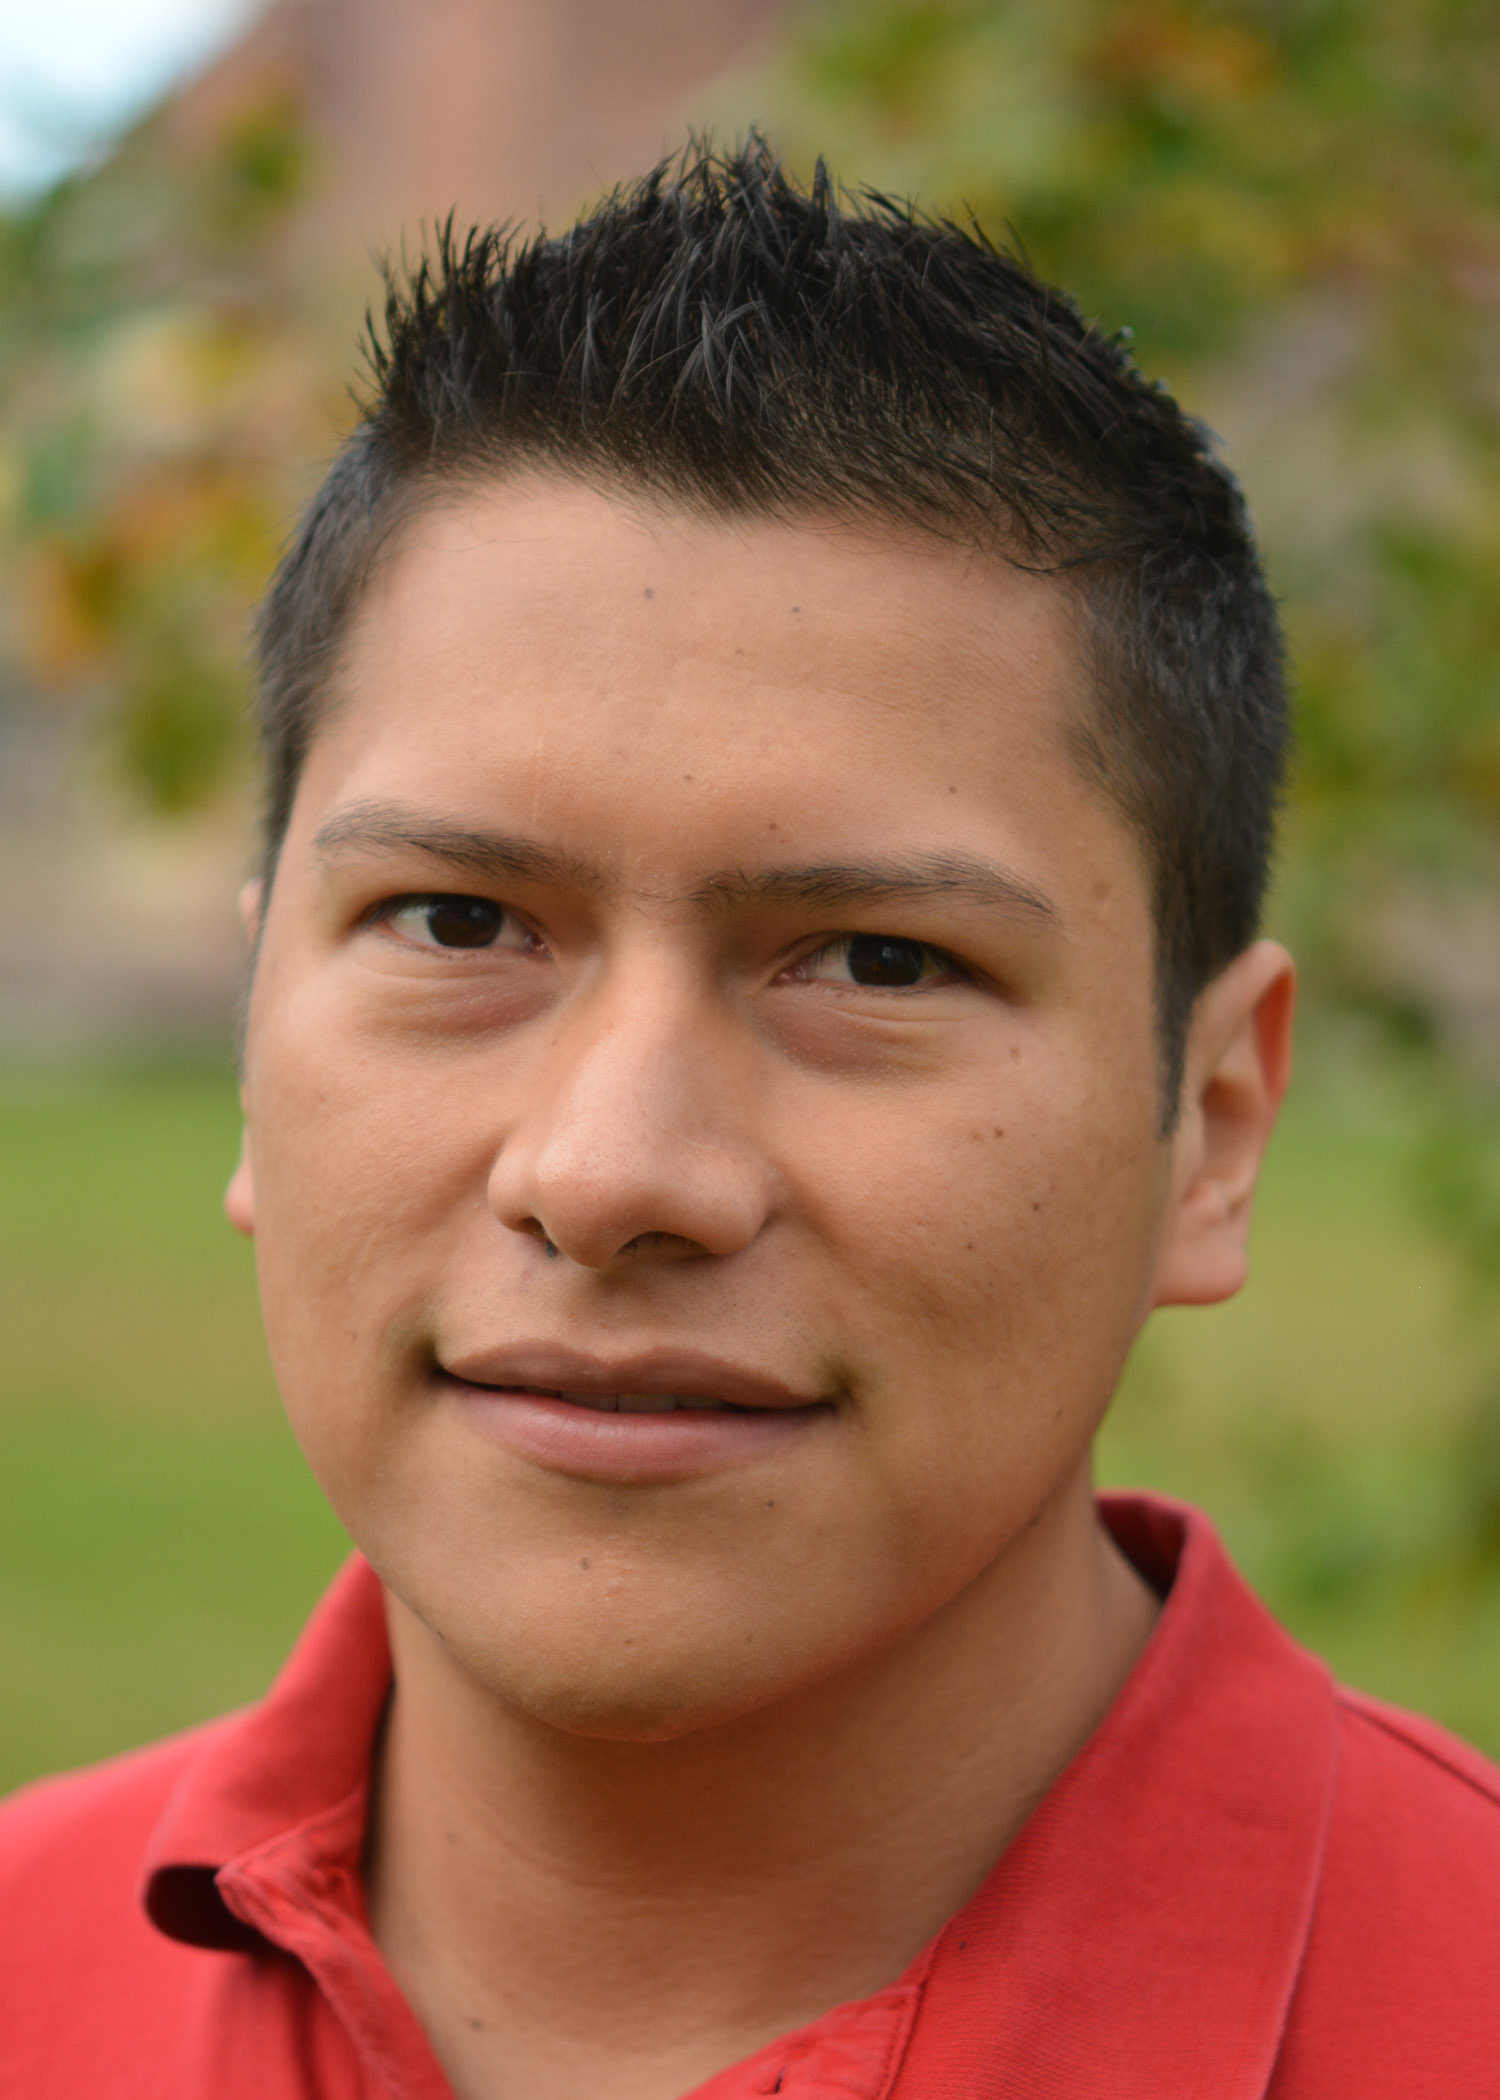 Salvador Aguilar Mendez